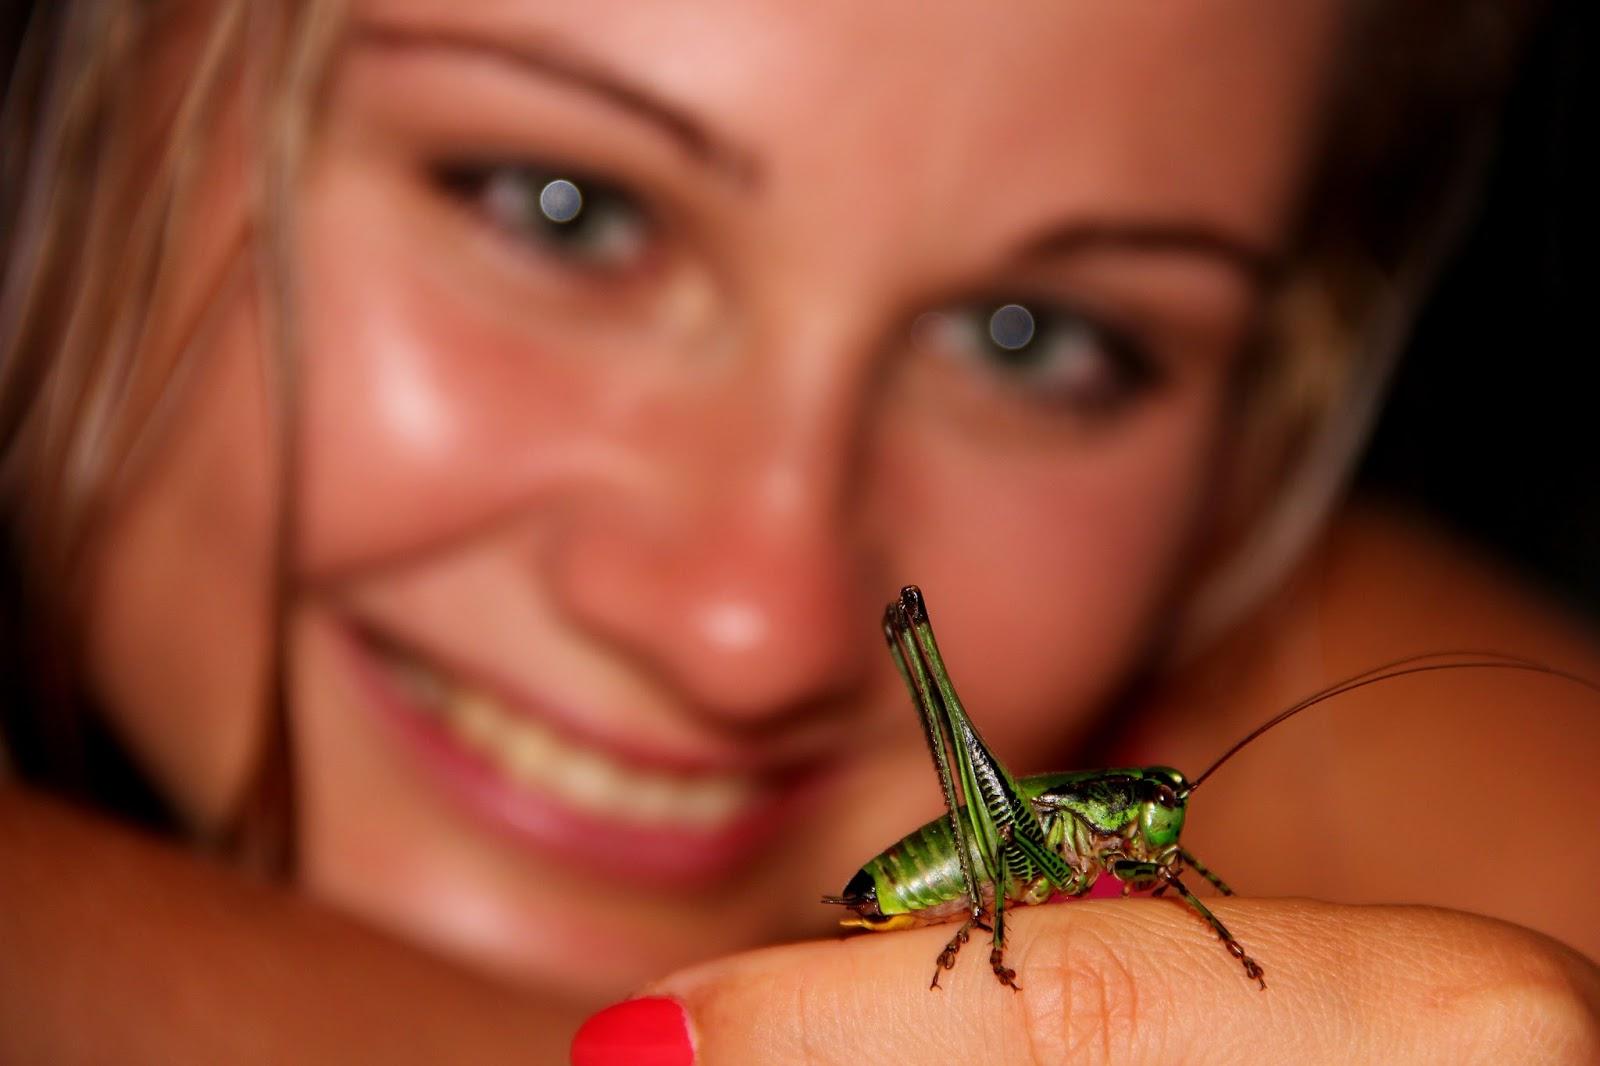 A lady holding a grasshopper.